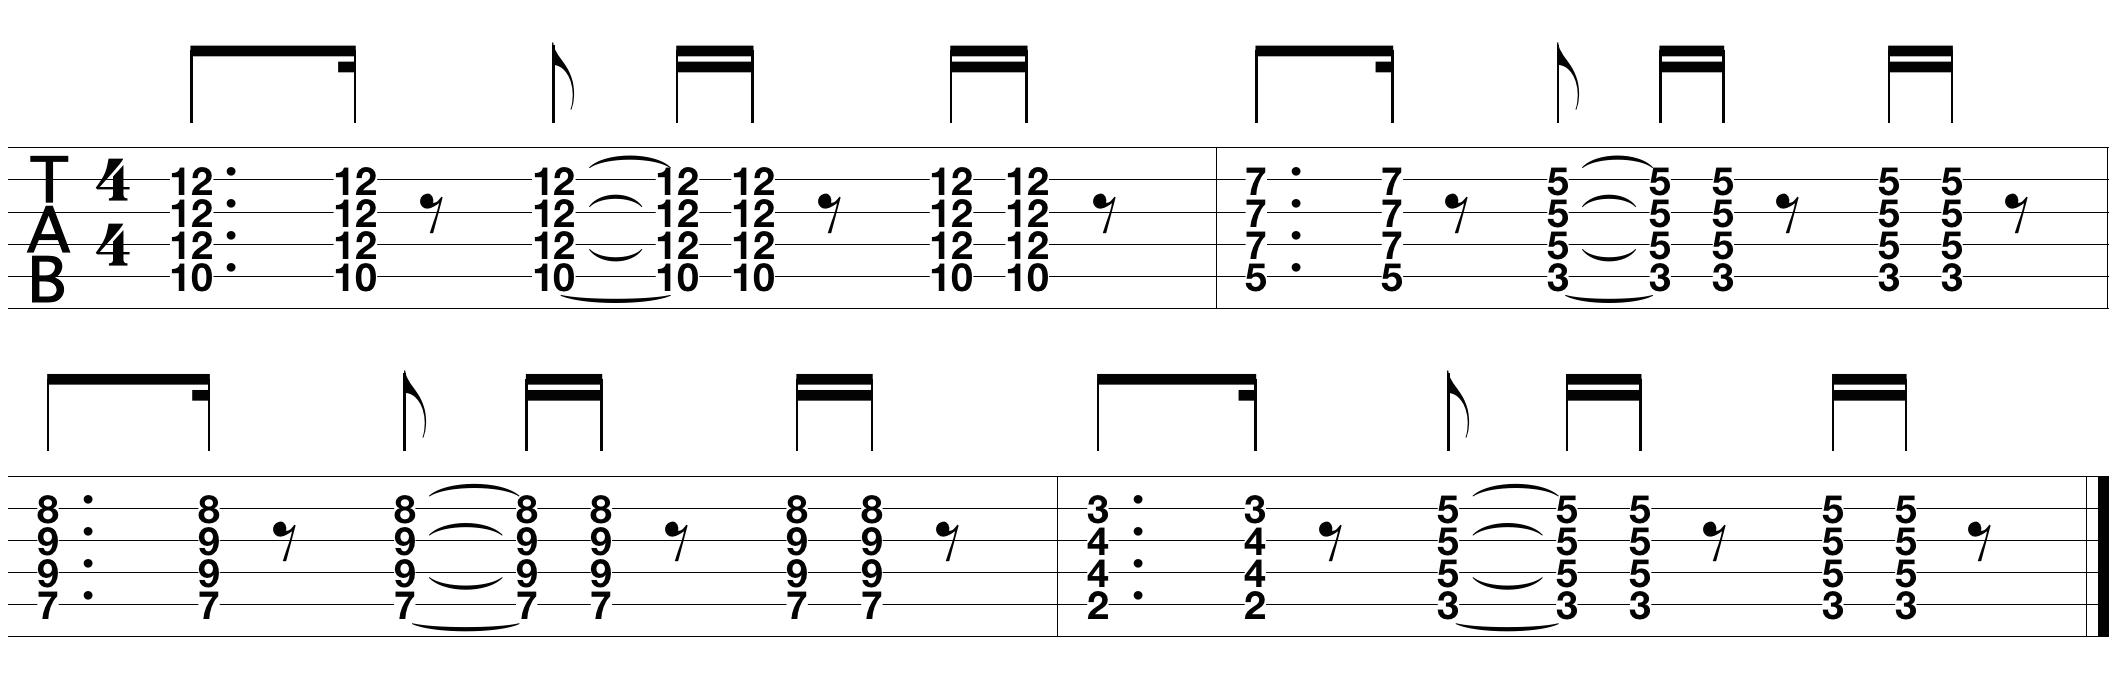 playing-rhythm-guitar.png